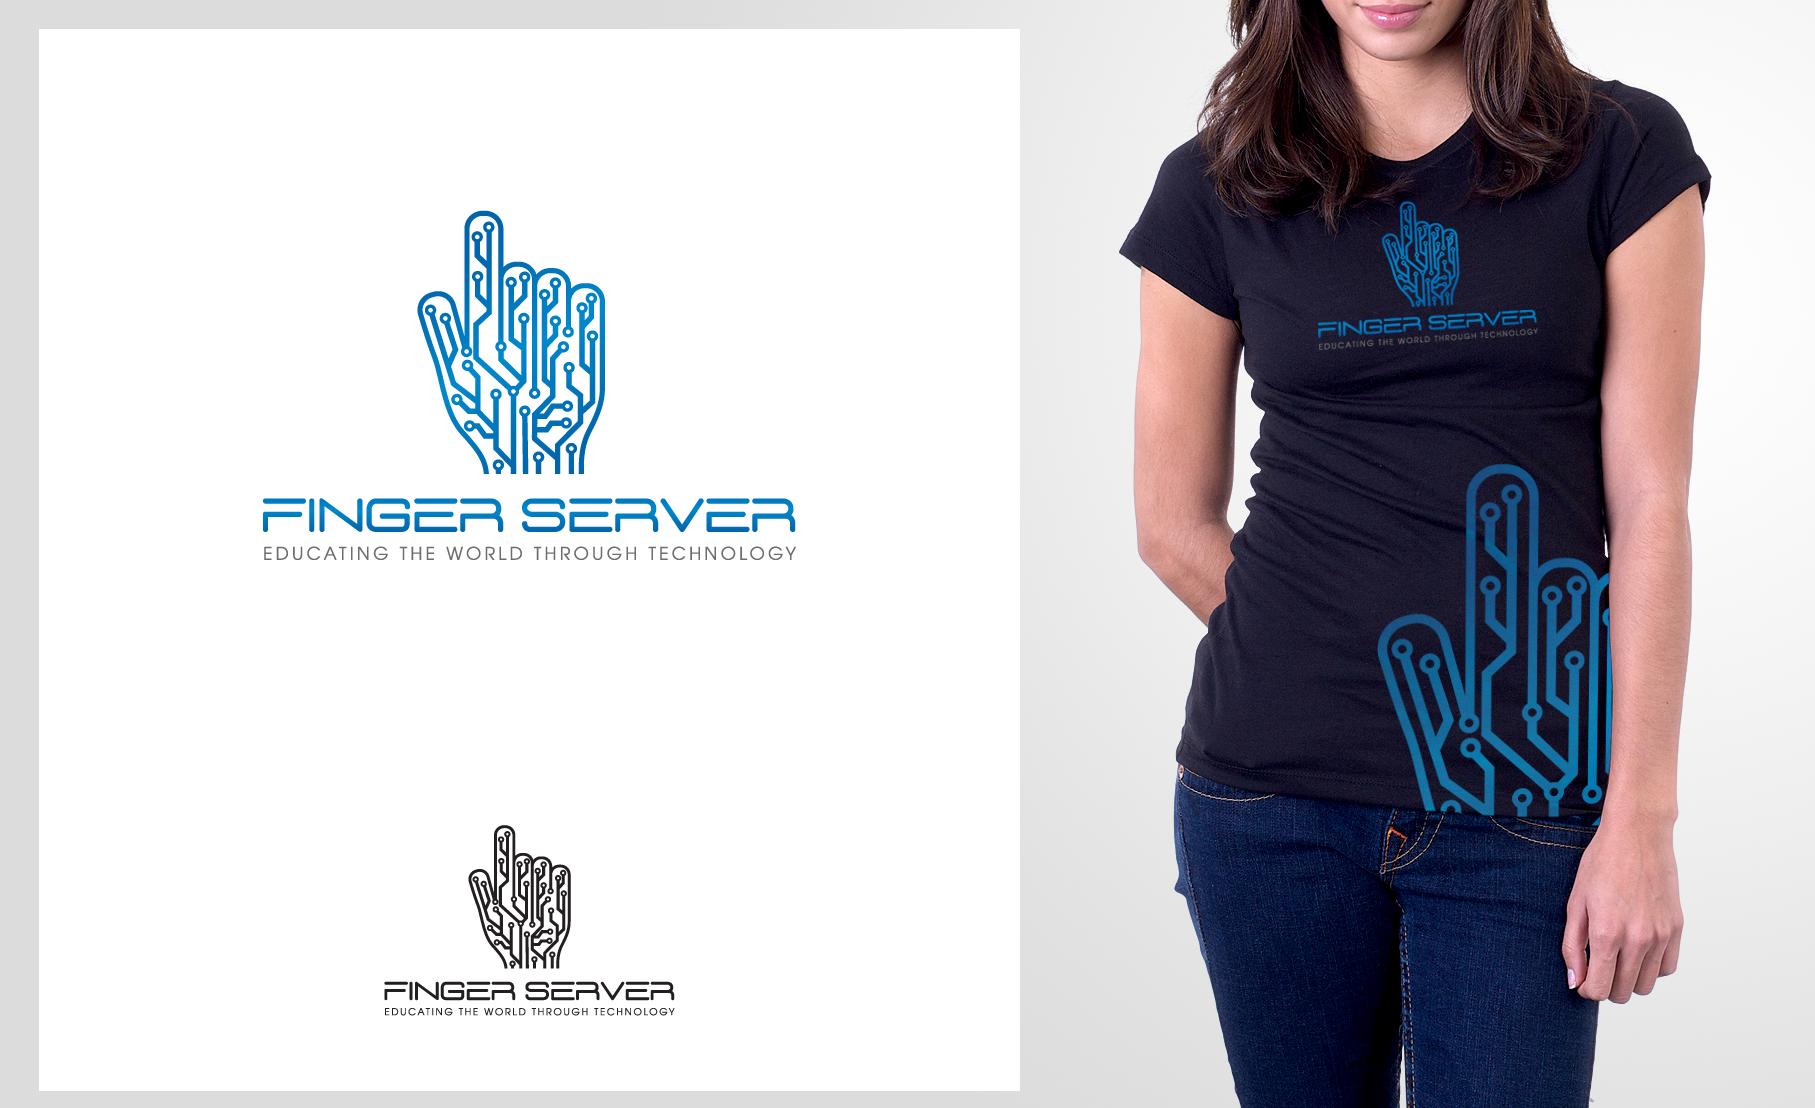 New logo wanted for Finger Server